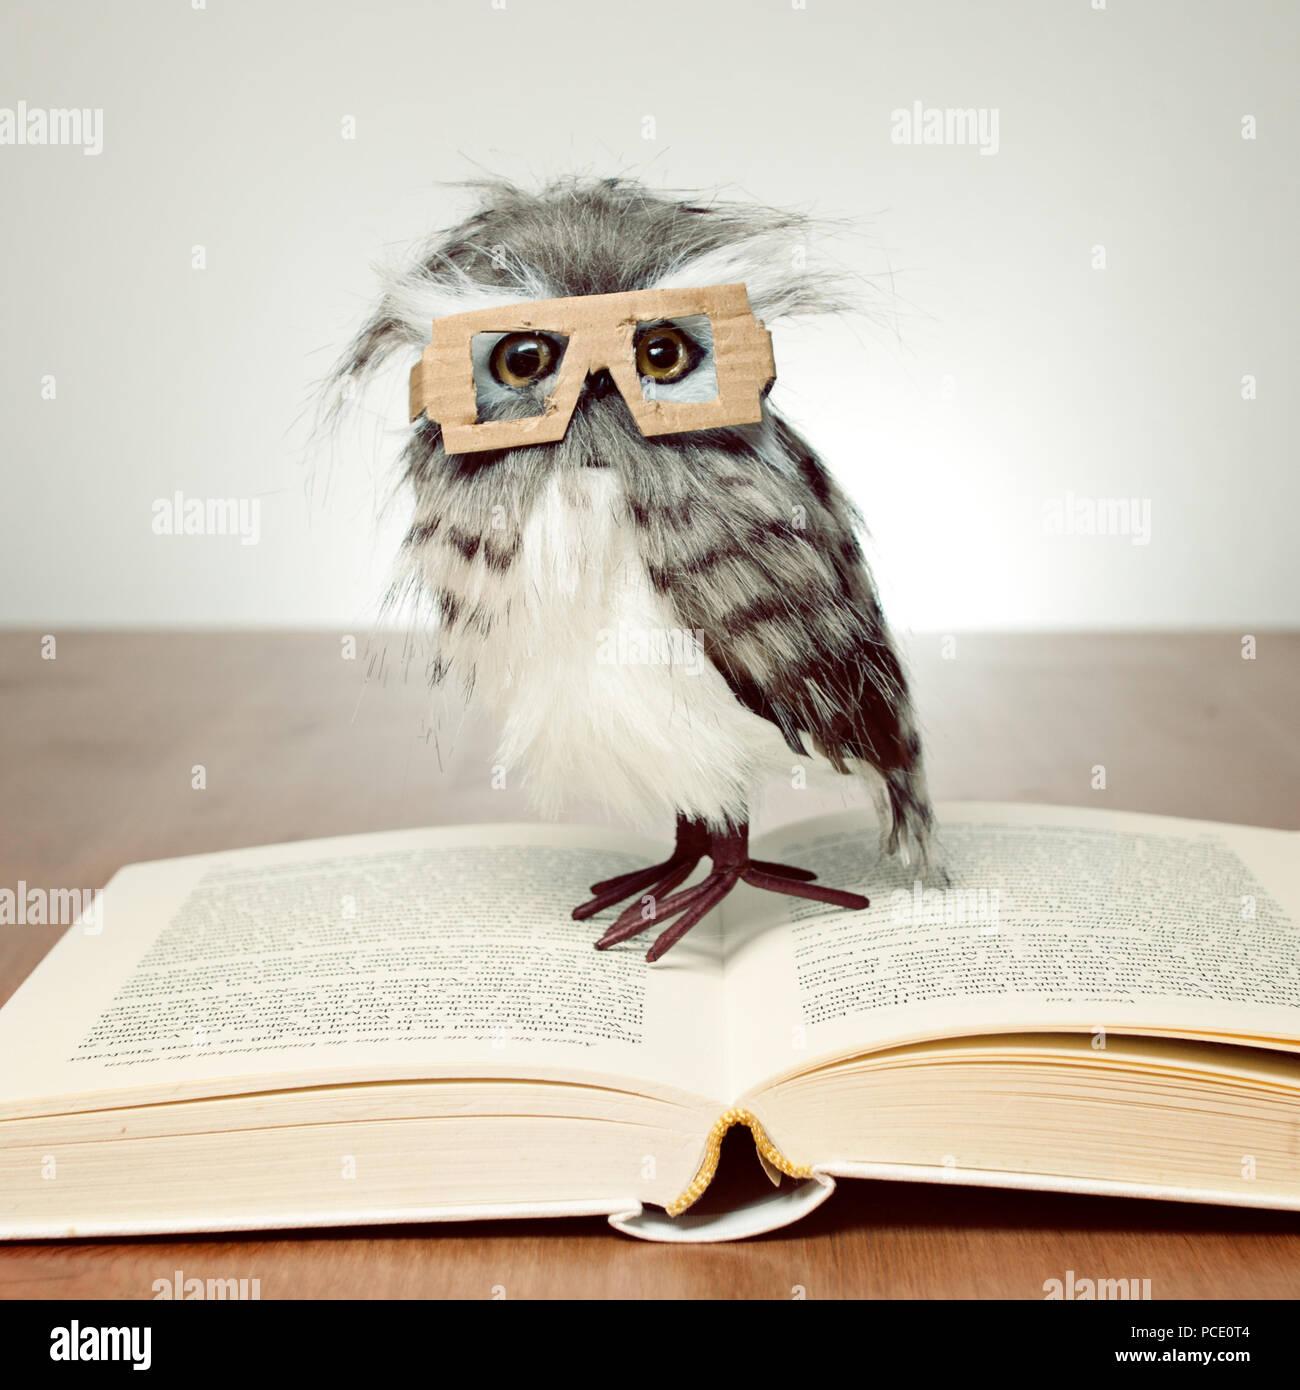 education,reading,owl,educated - Stock Image